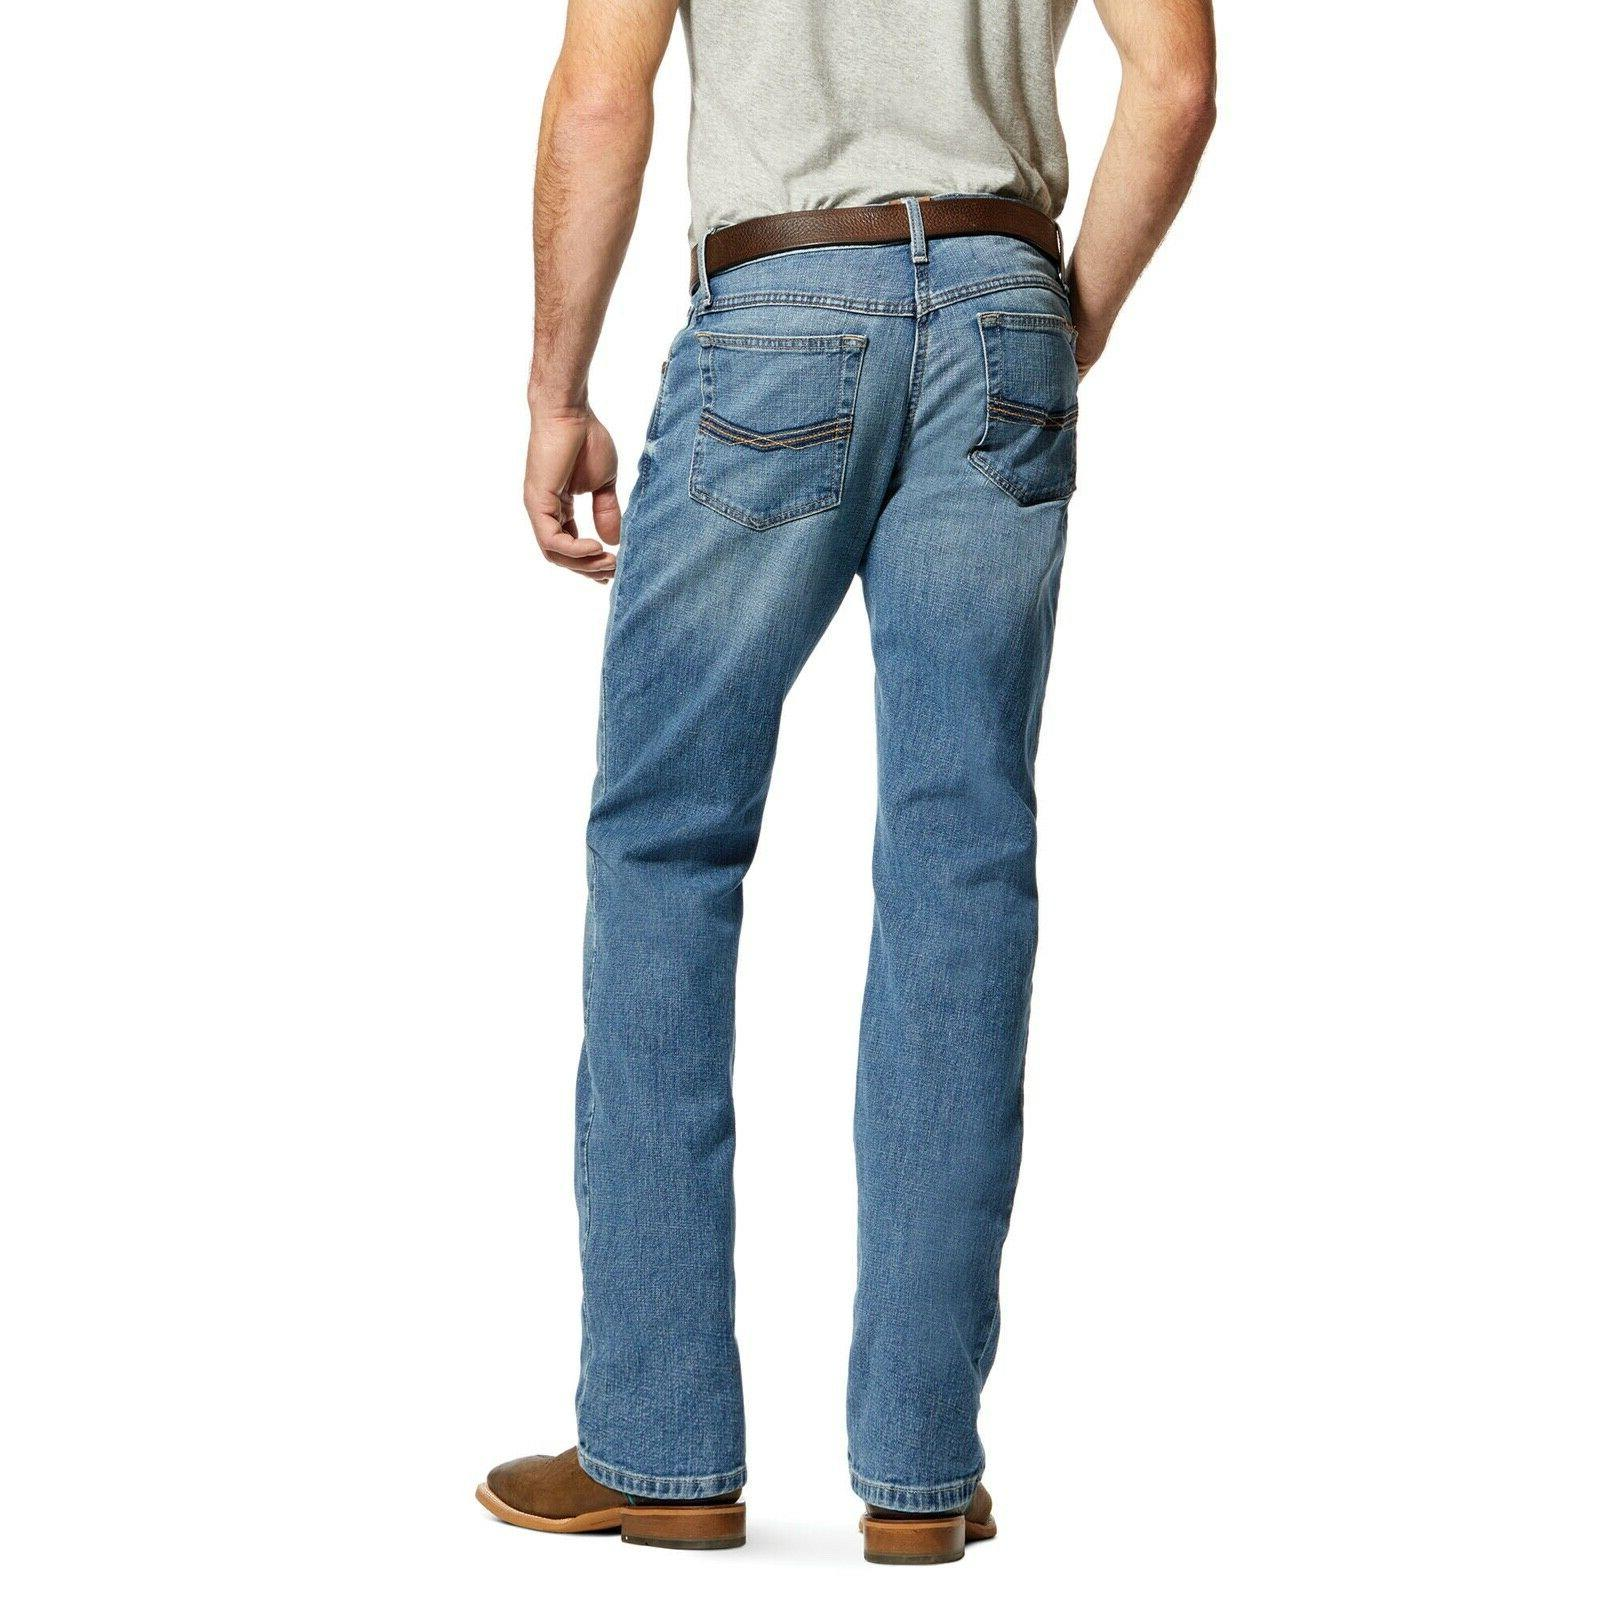 Ariat® Men's M4 Sawyer Stretch Fit Leg Jeans